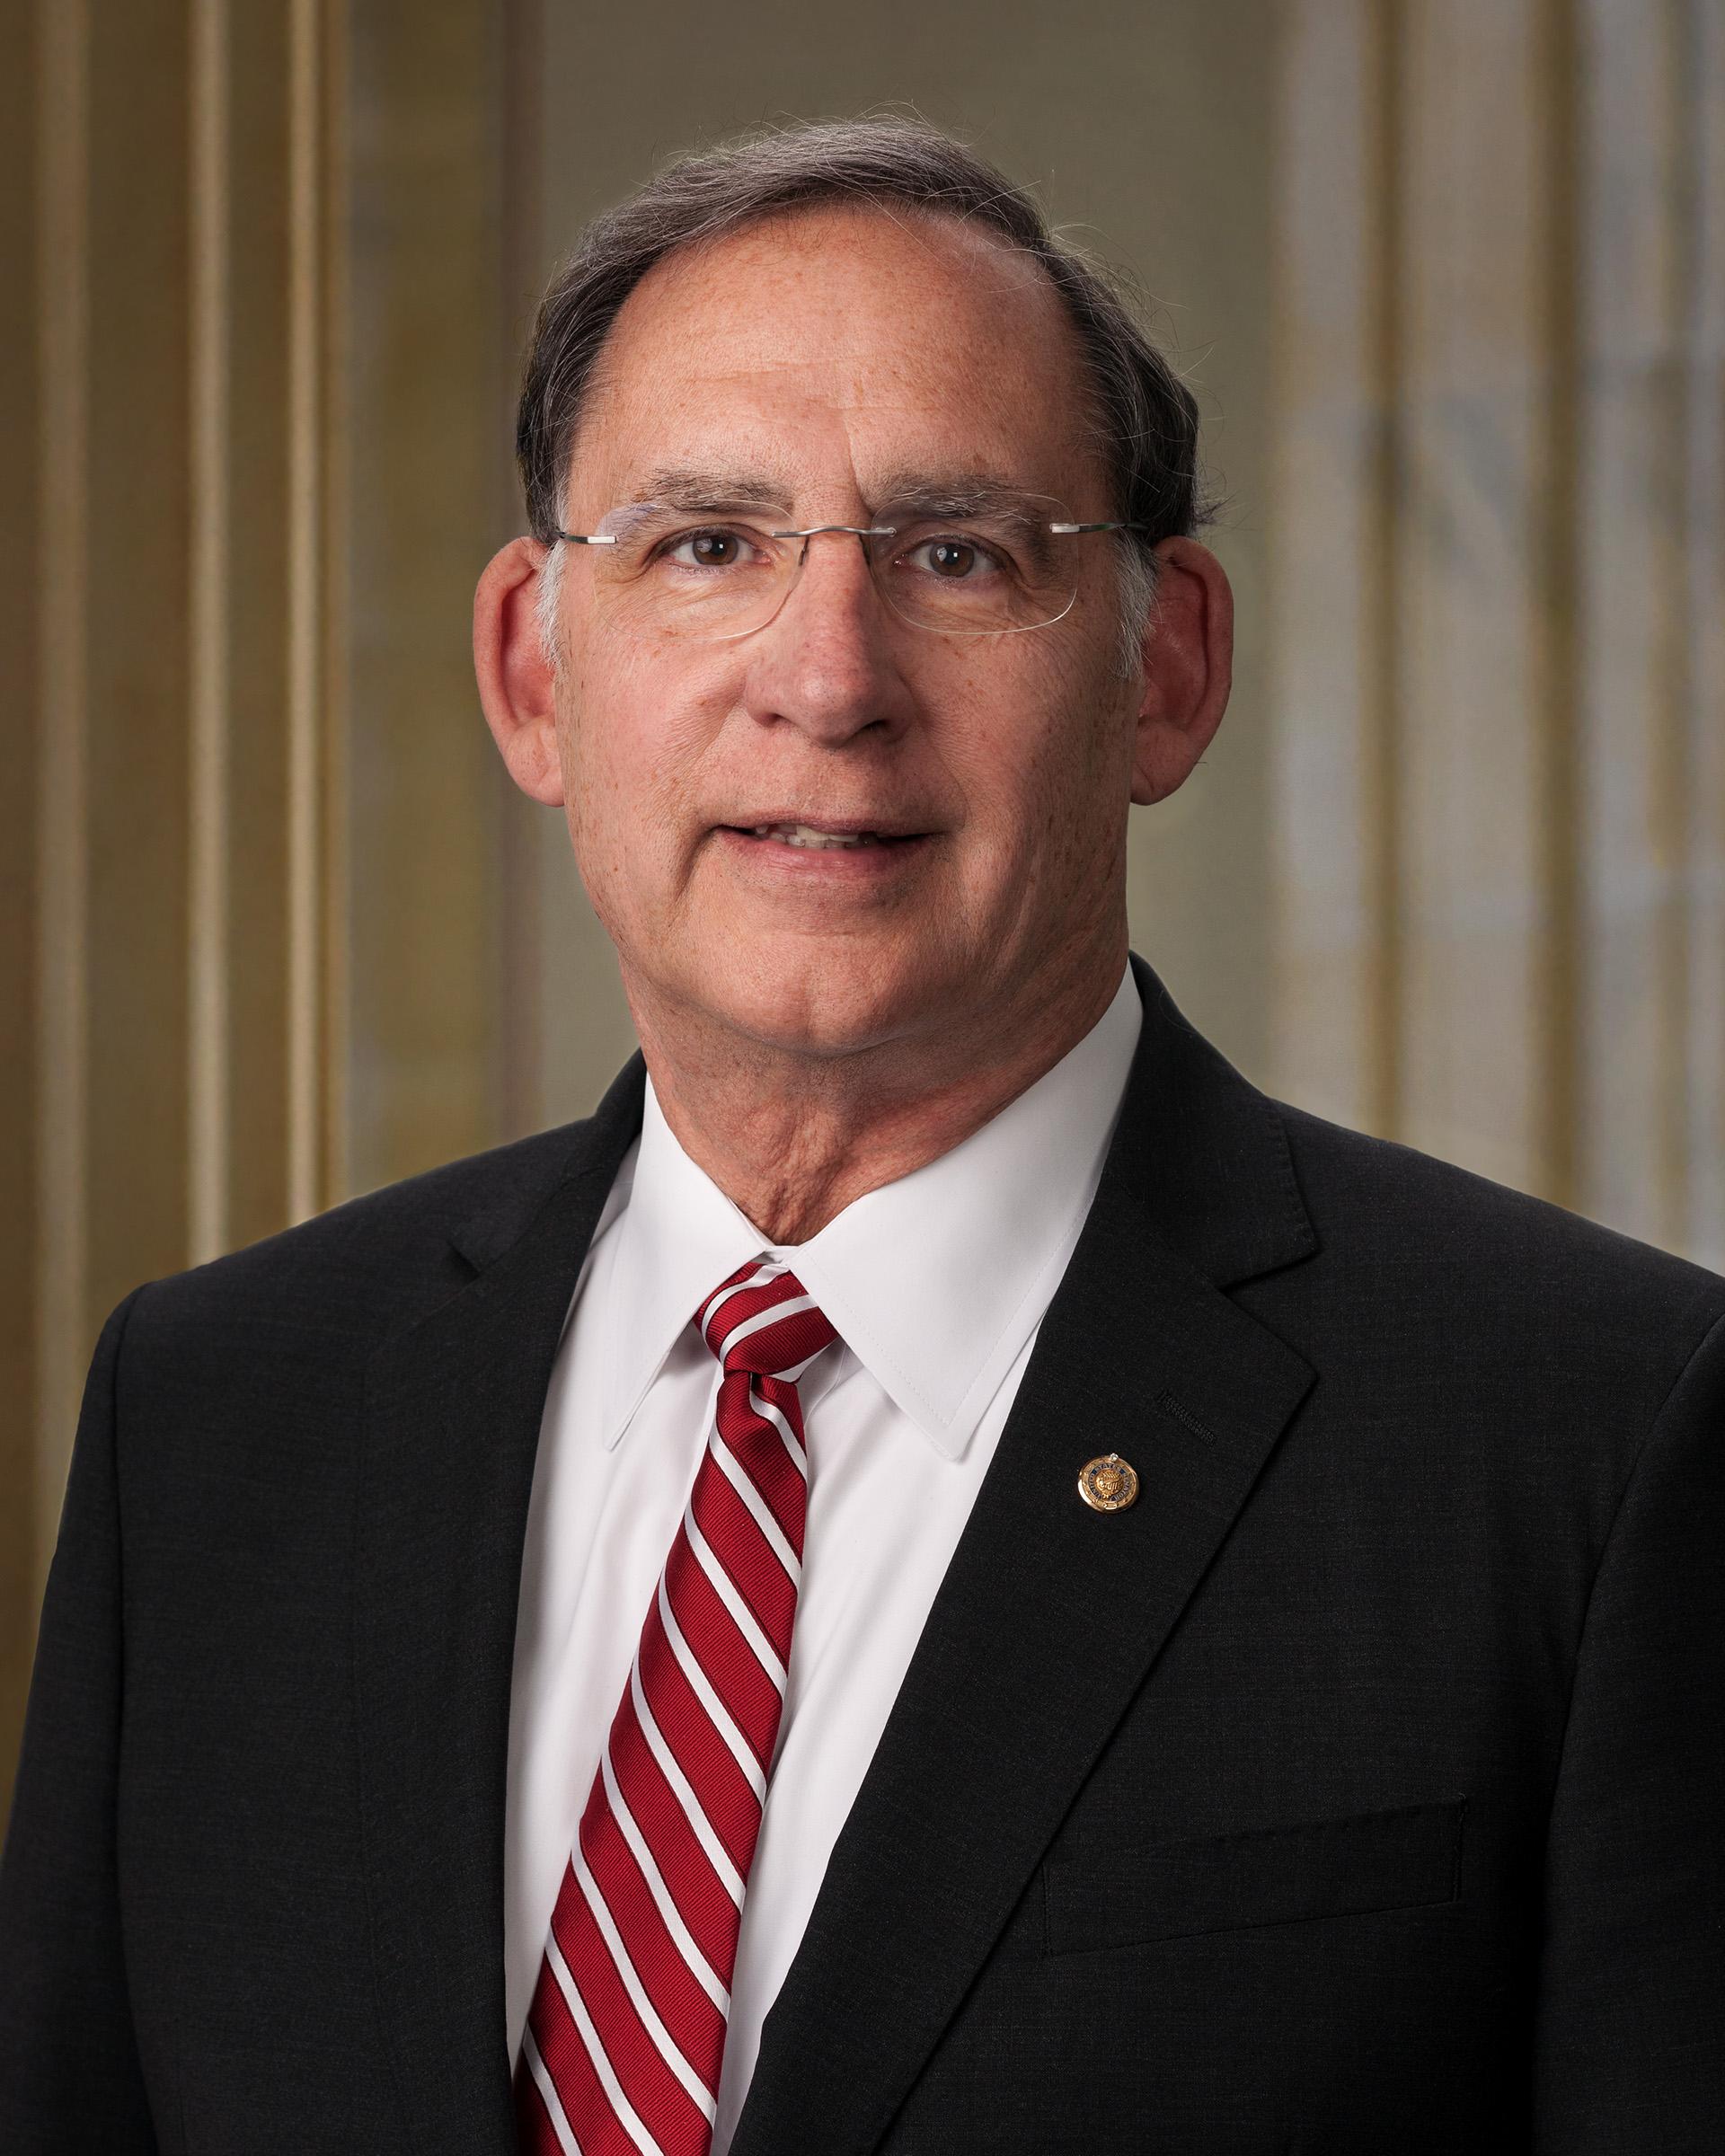 Senator John Boozman